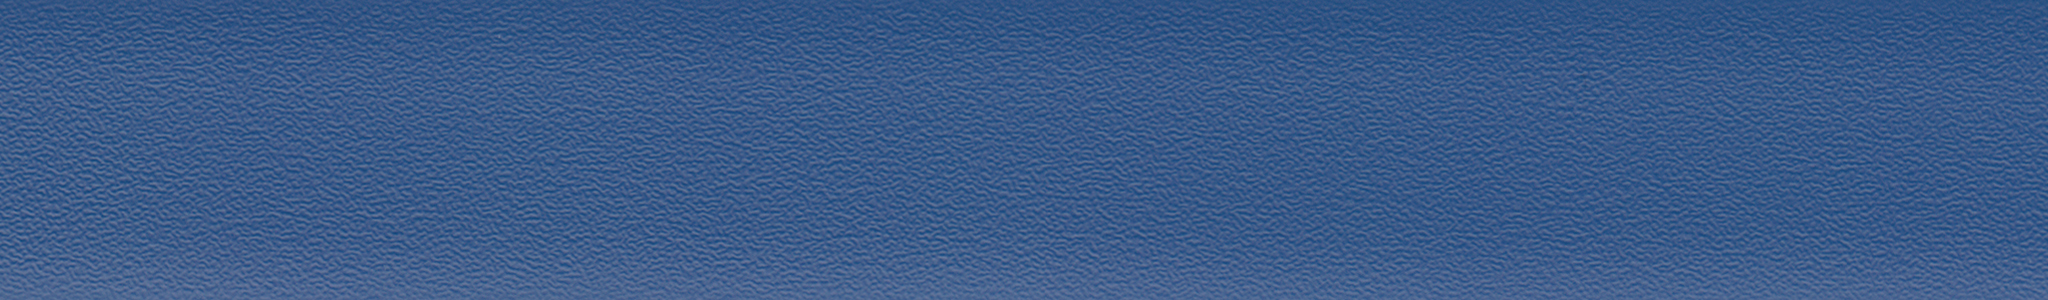 HU 15128 ABS Kante UNI Blau perl 101